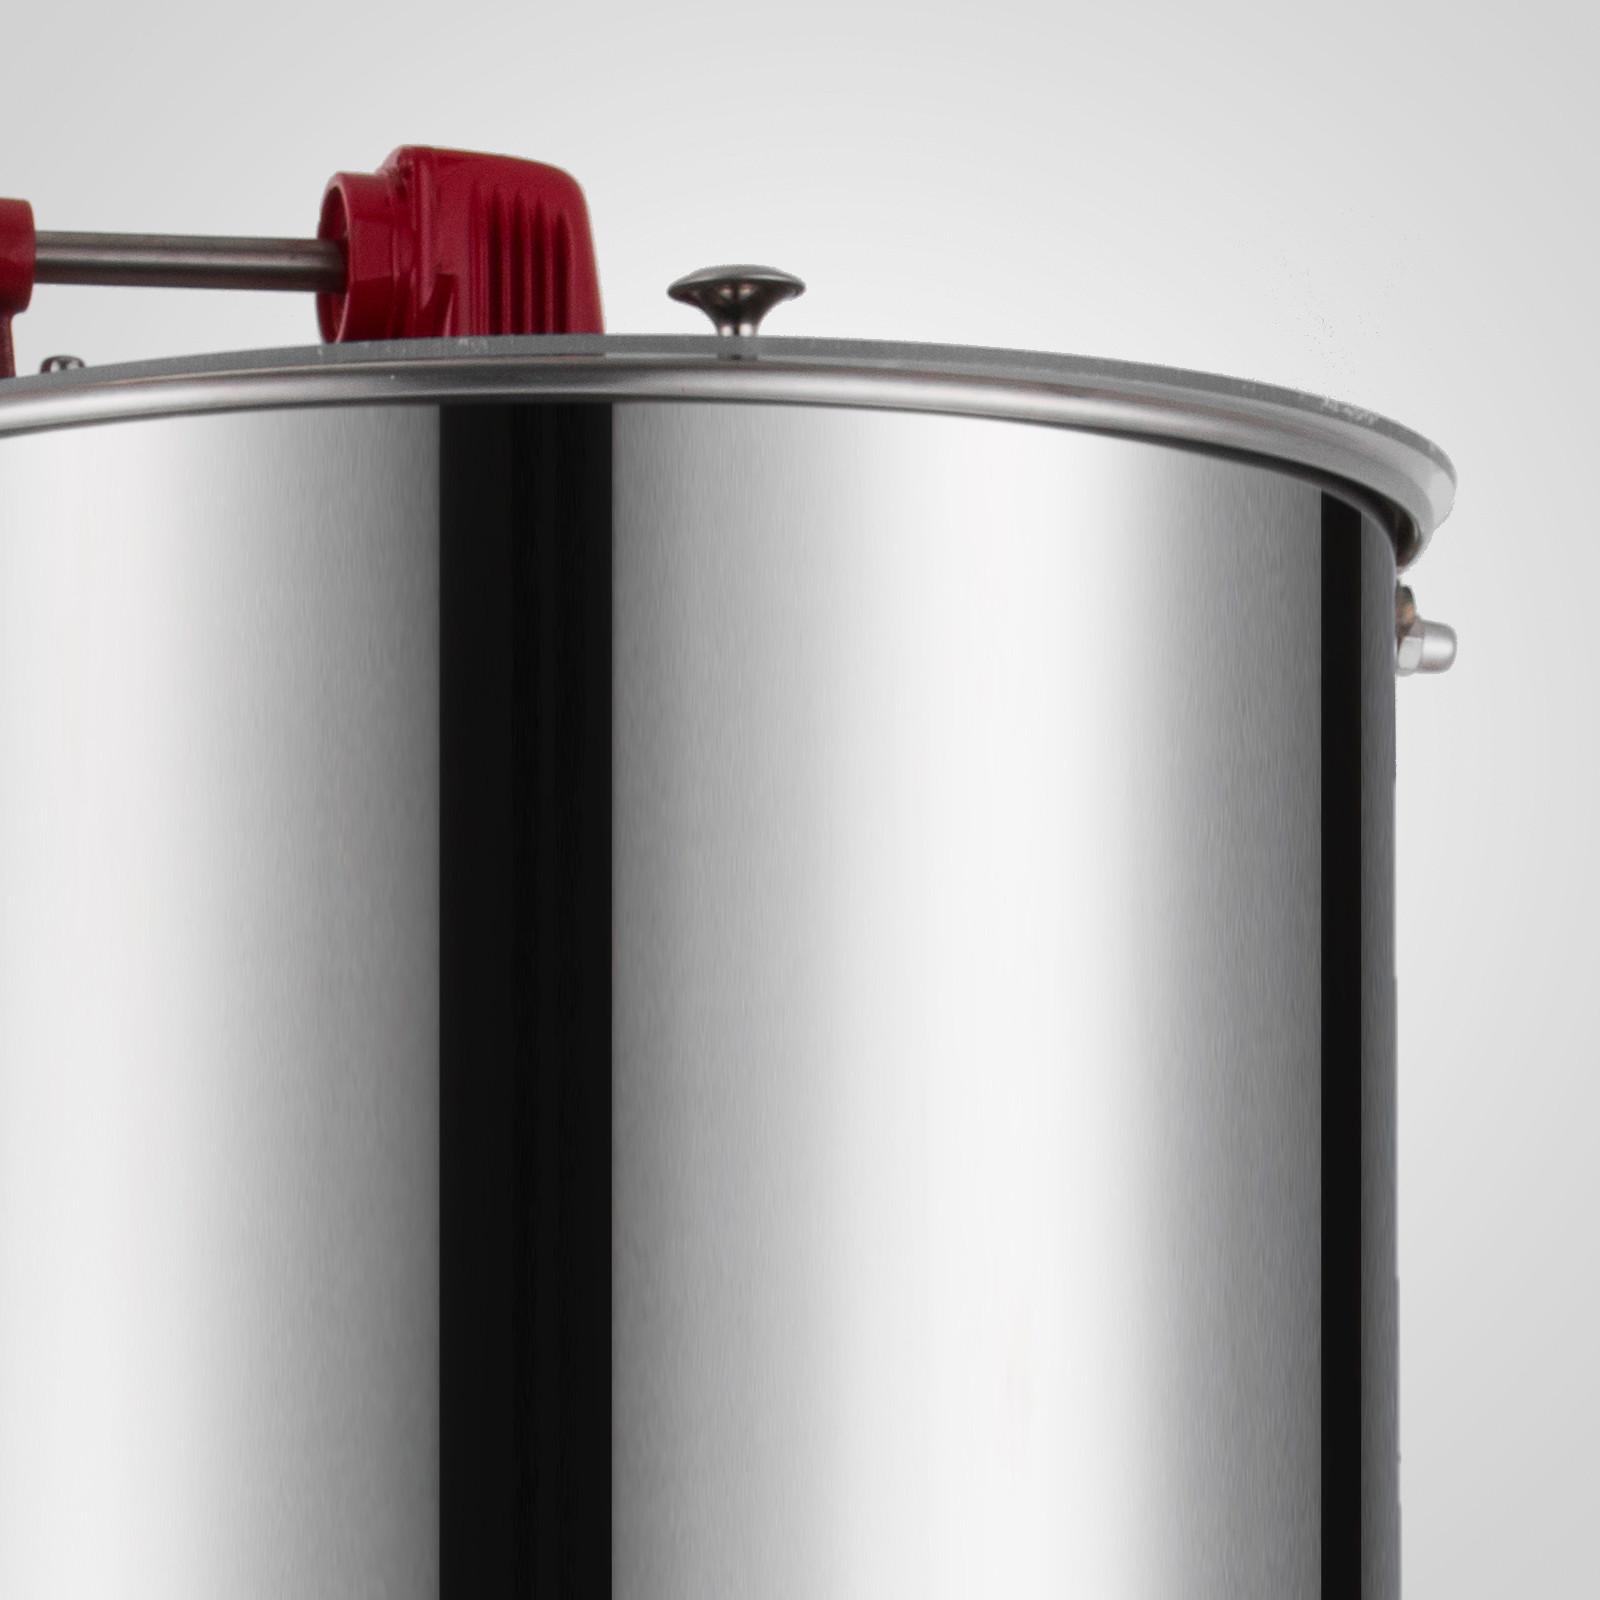 Extracteur-de-Miel-Electrique-manuelle-2-3-4-Cadres-En-Acier-Inox-Centrifugeuse miniature 81